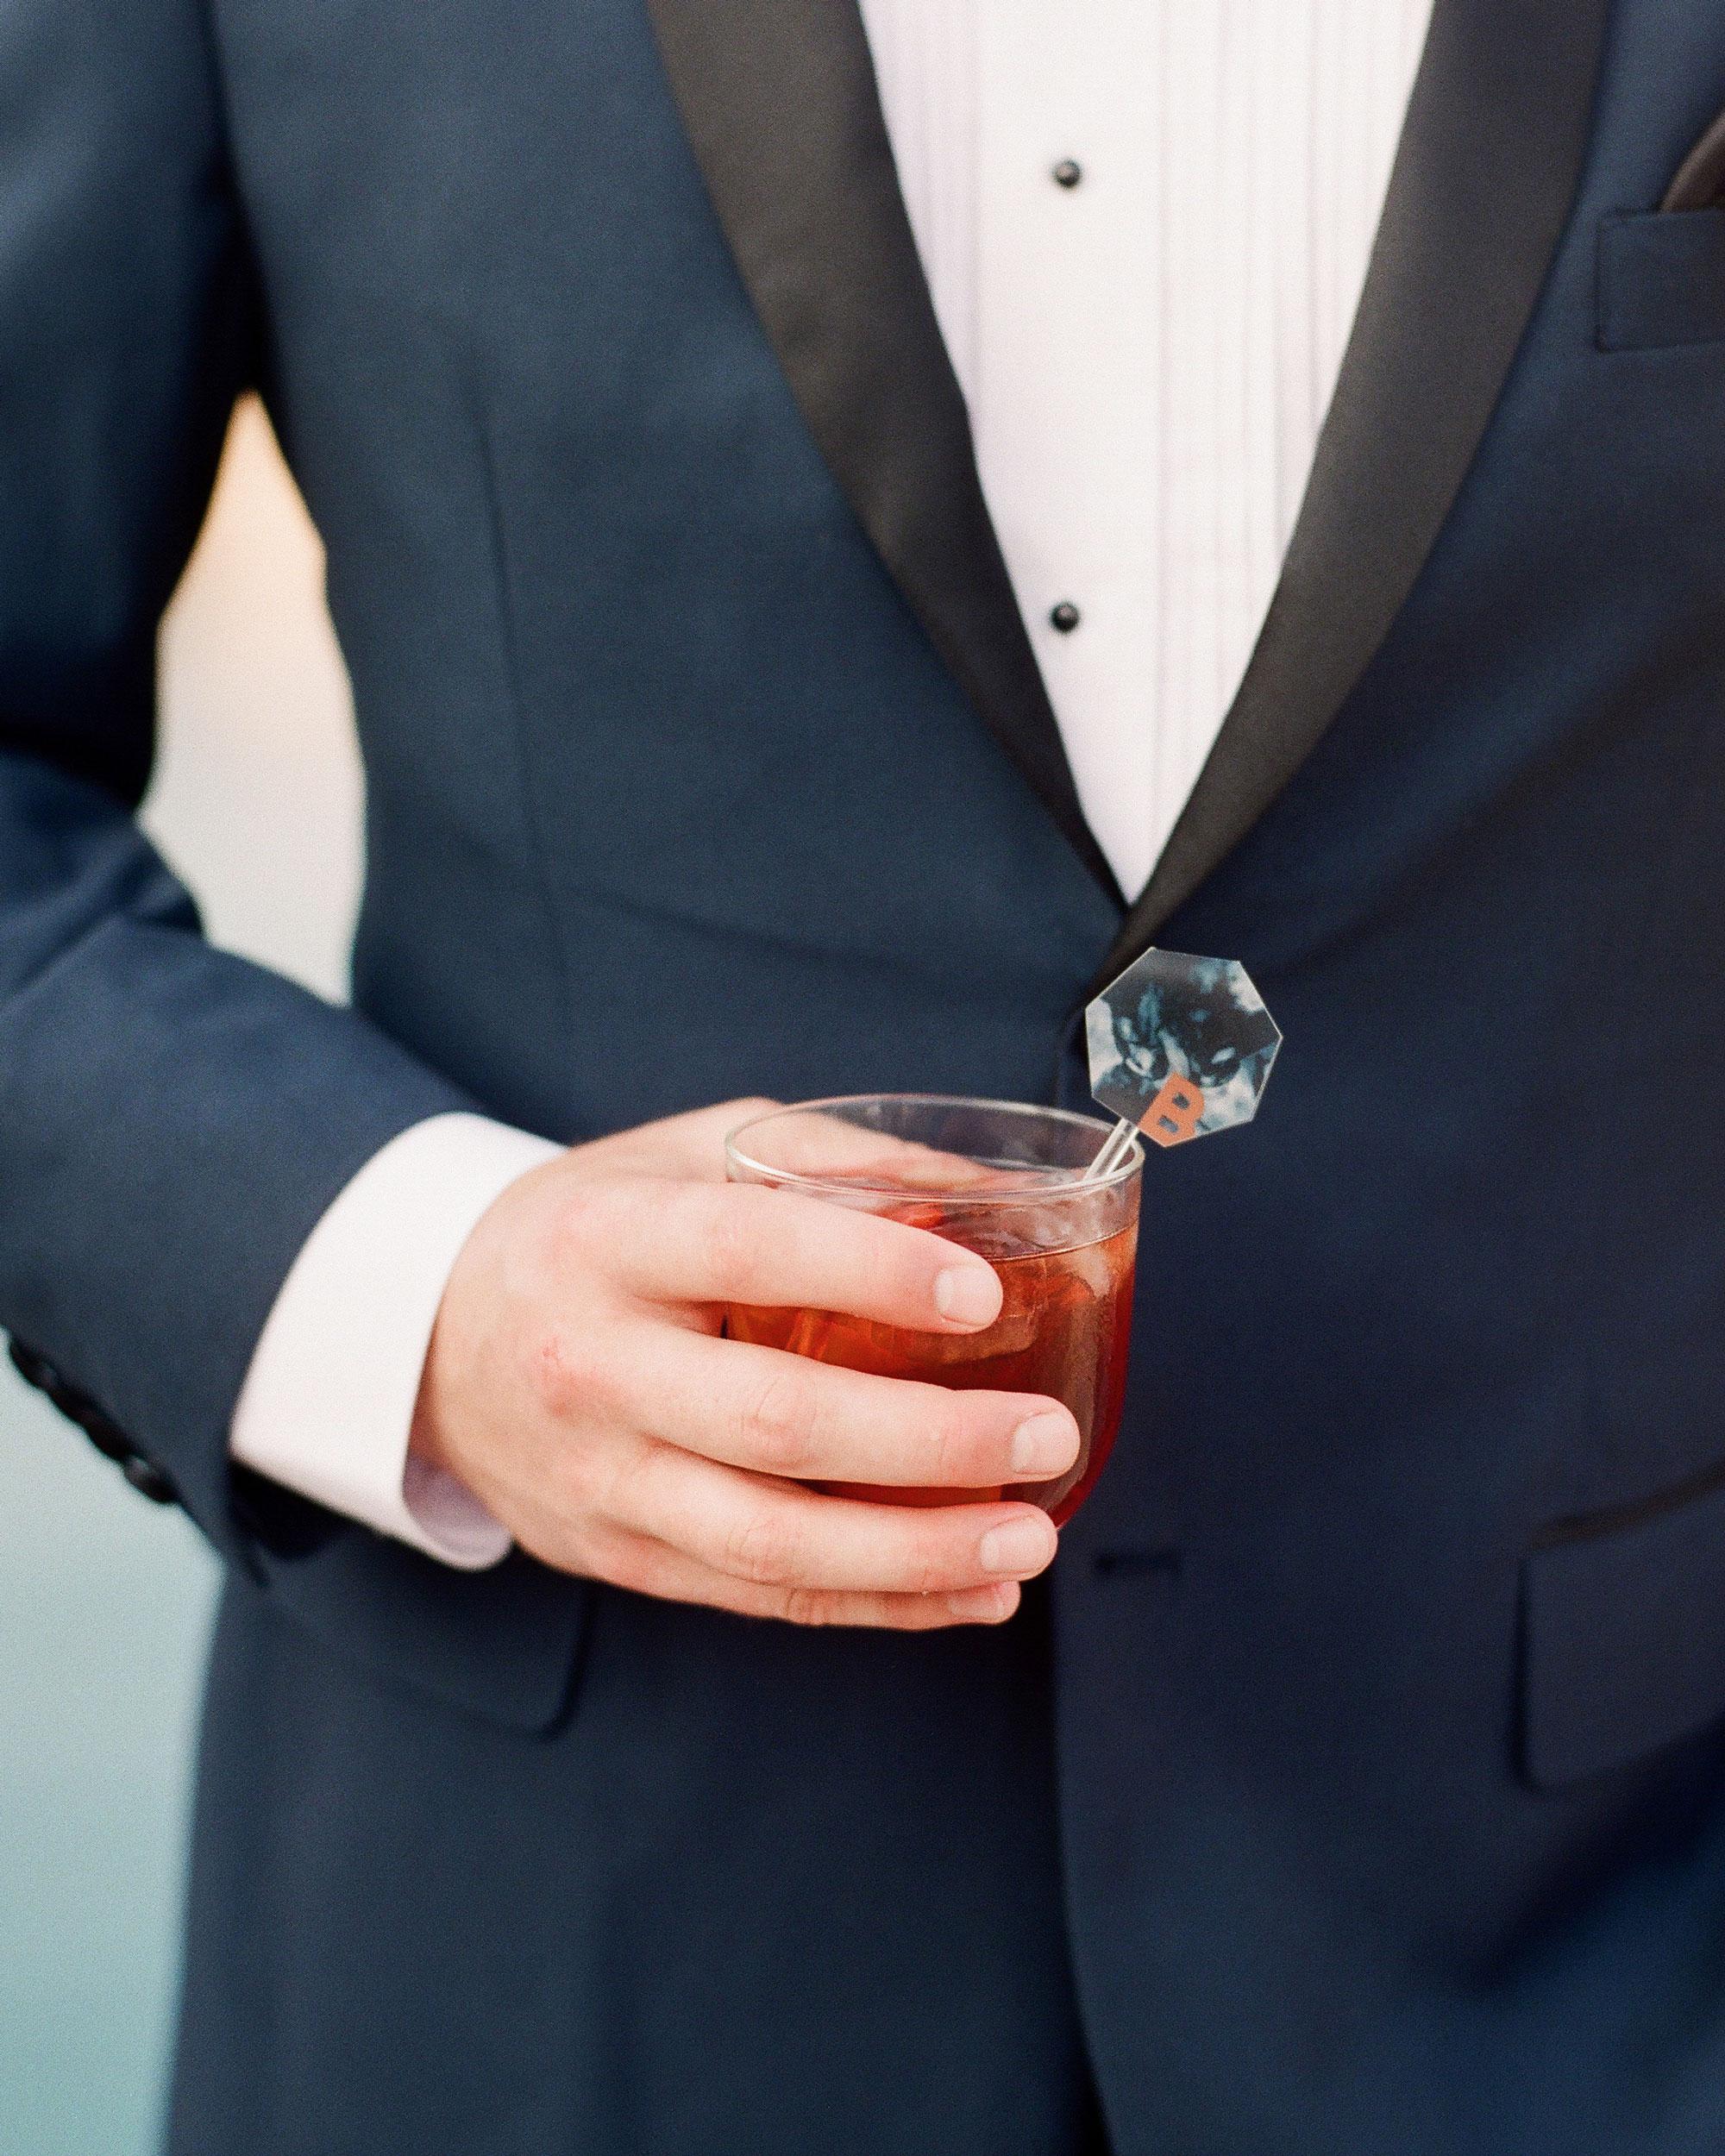 dennis-bryan-wedding-italy-cocktail-012-0556-s112633.jpg